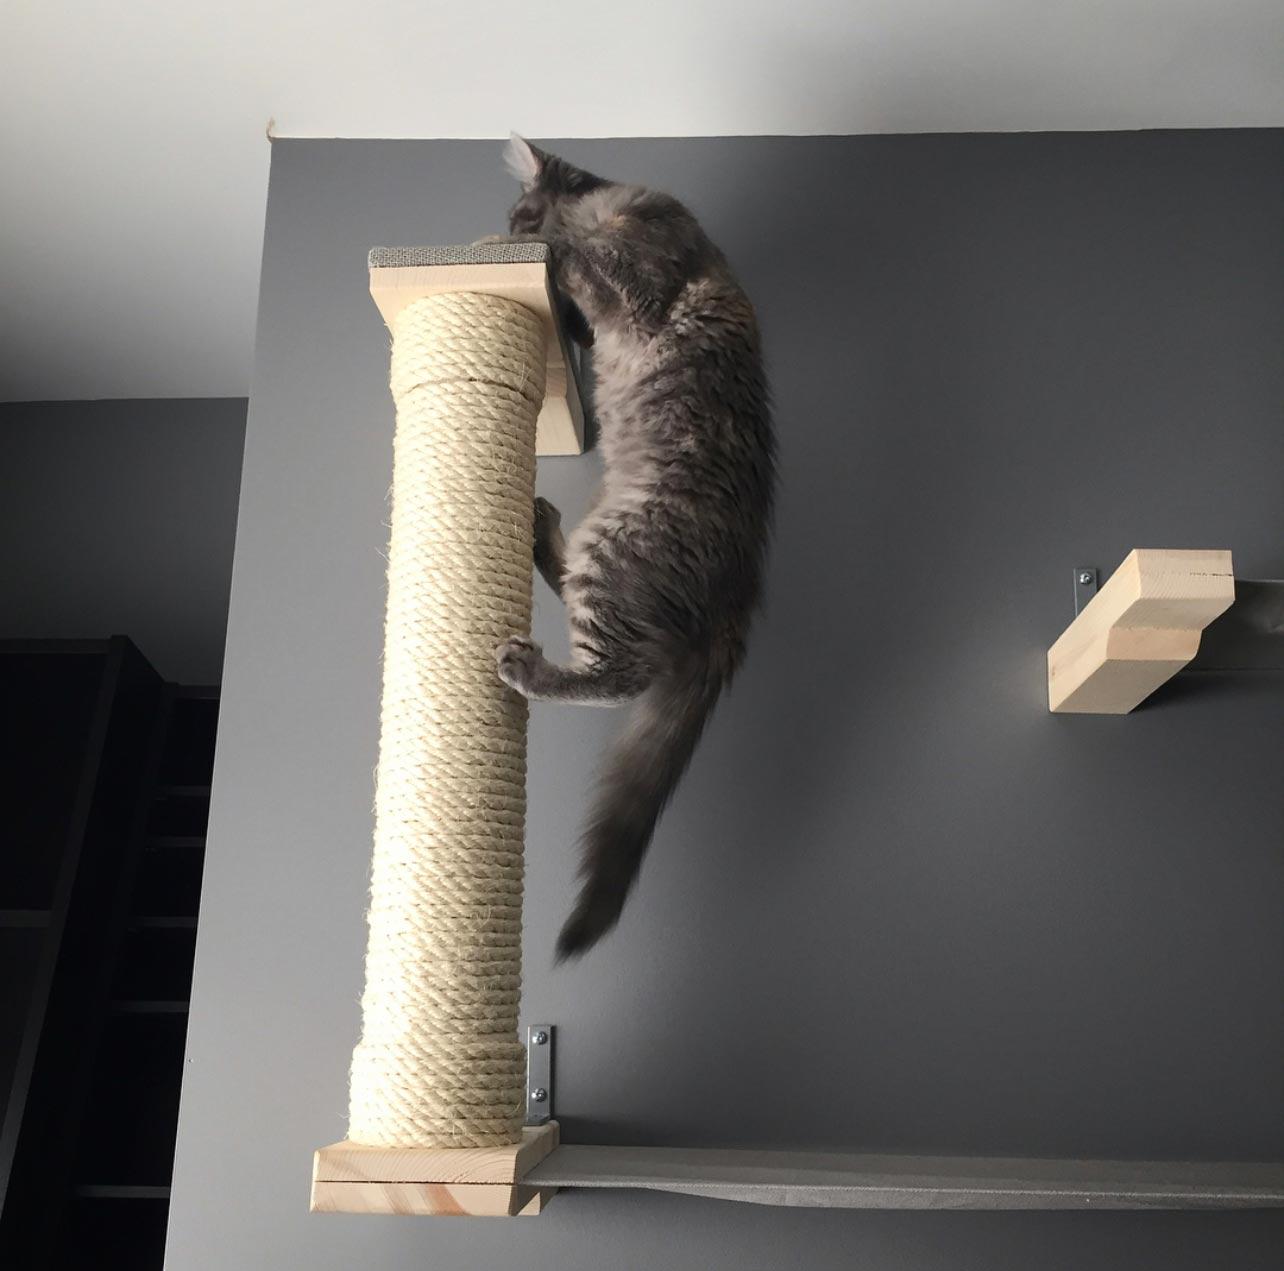 cat climbing scratching post